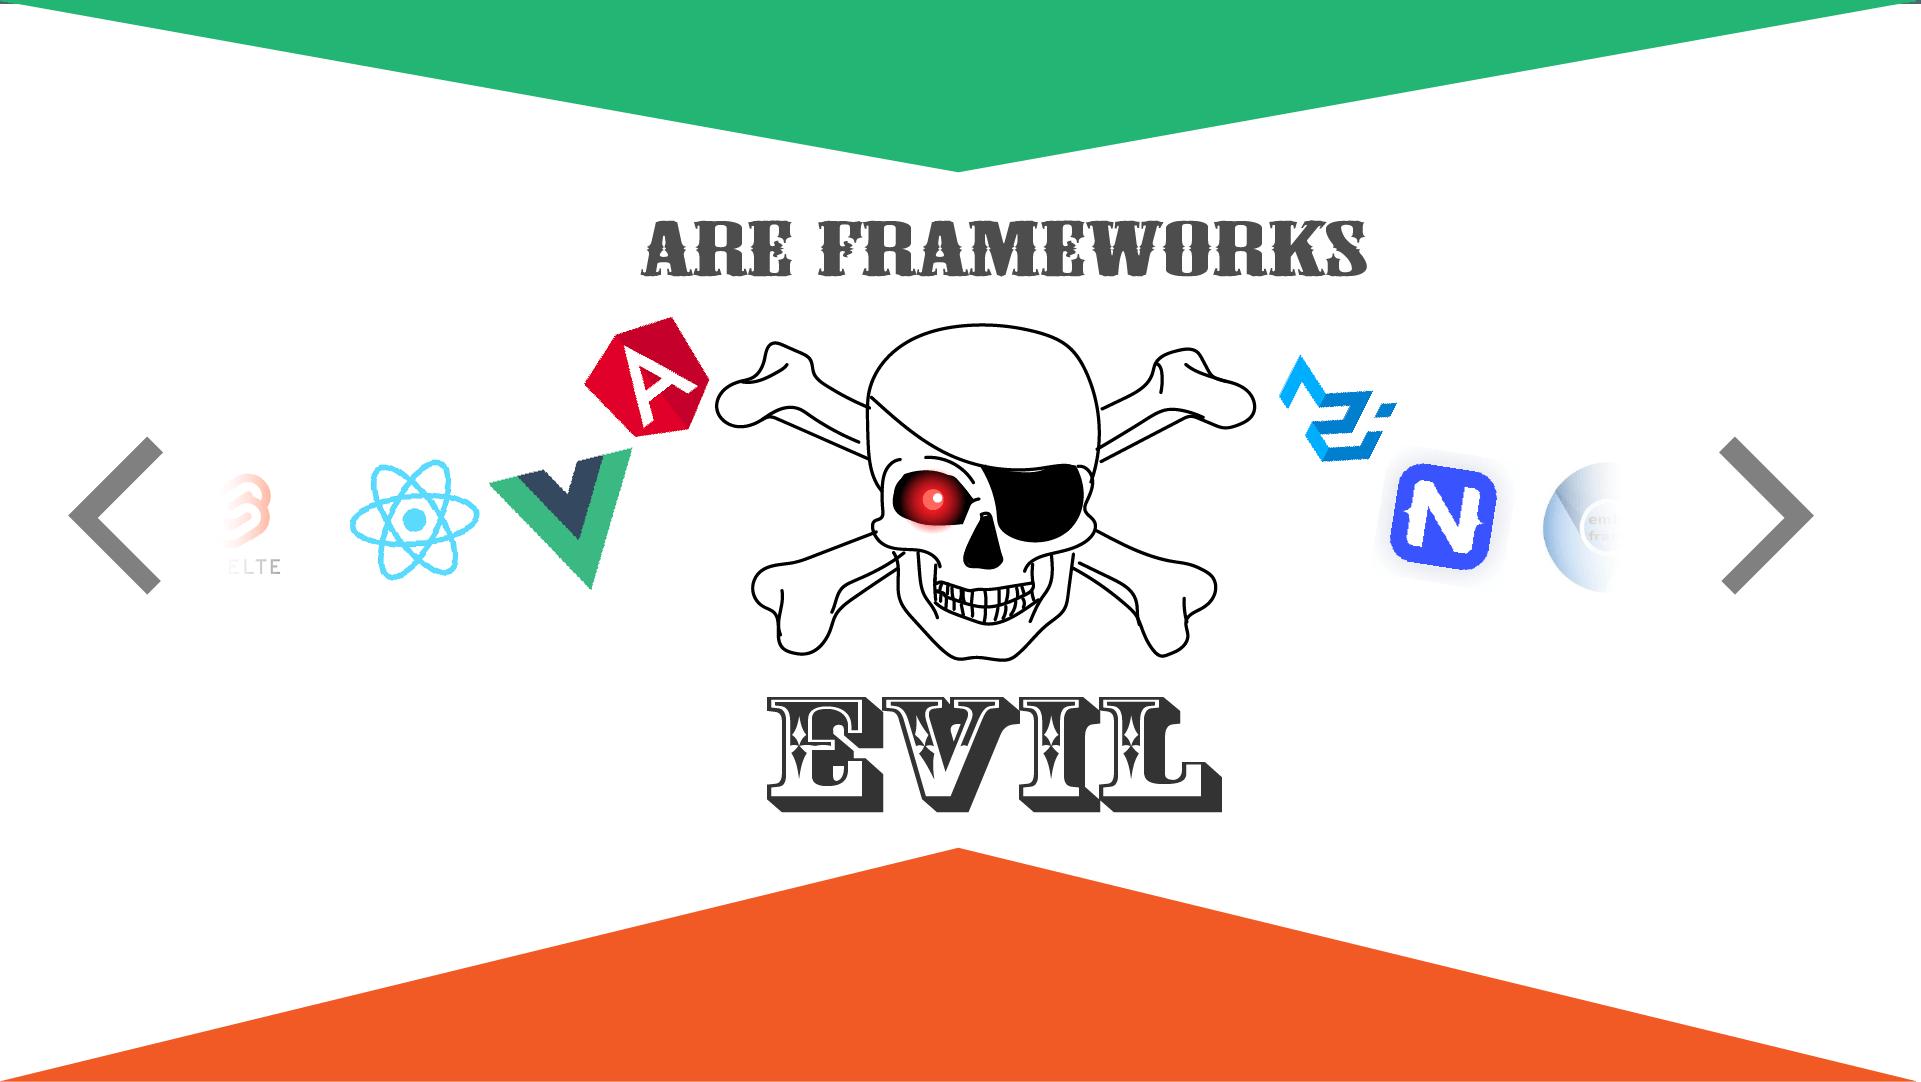 are frameworks evil?